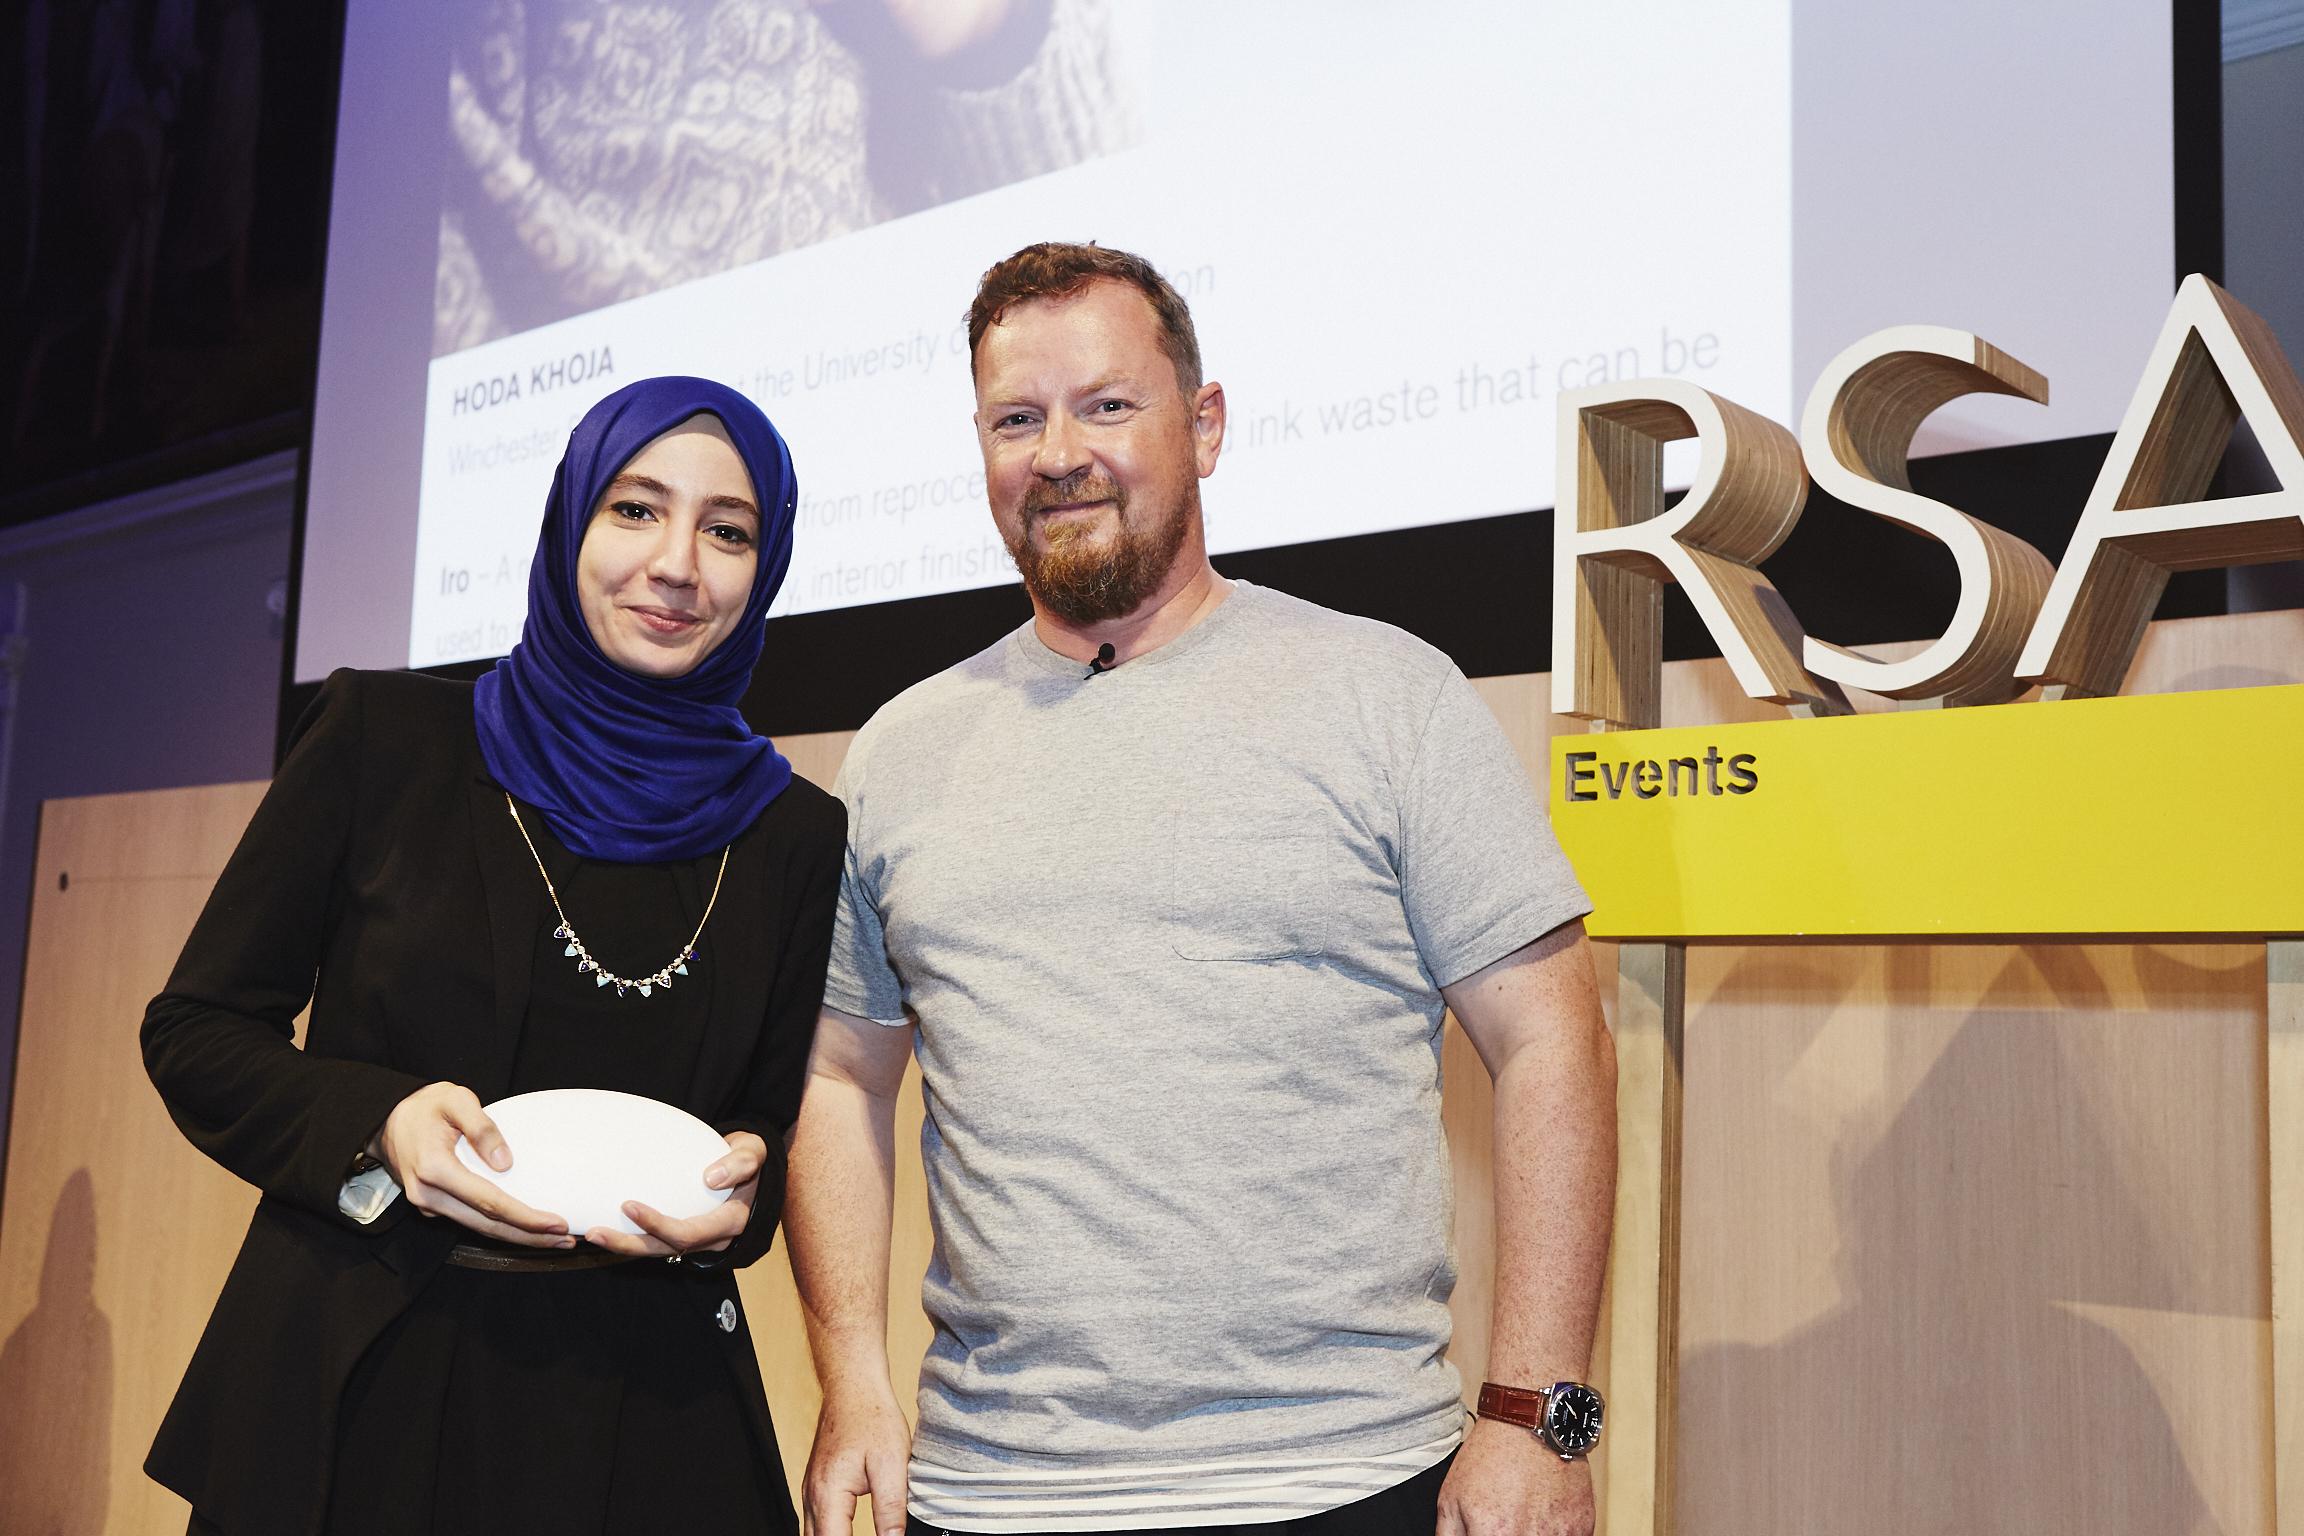 Huda Khoja with Richard Clarke of Nike, Former RSA Student Design Award Winner